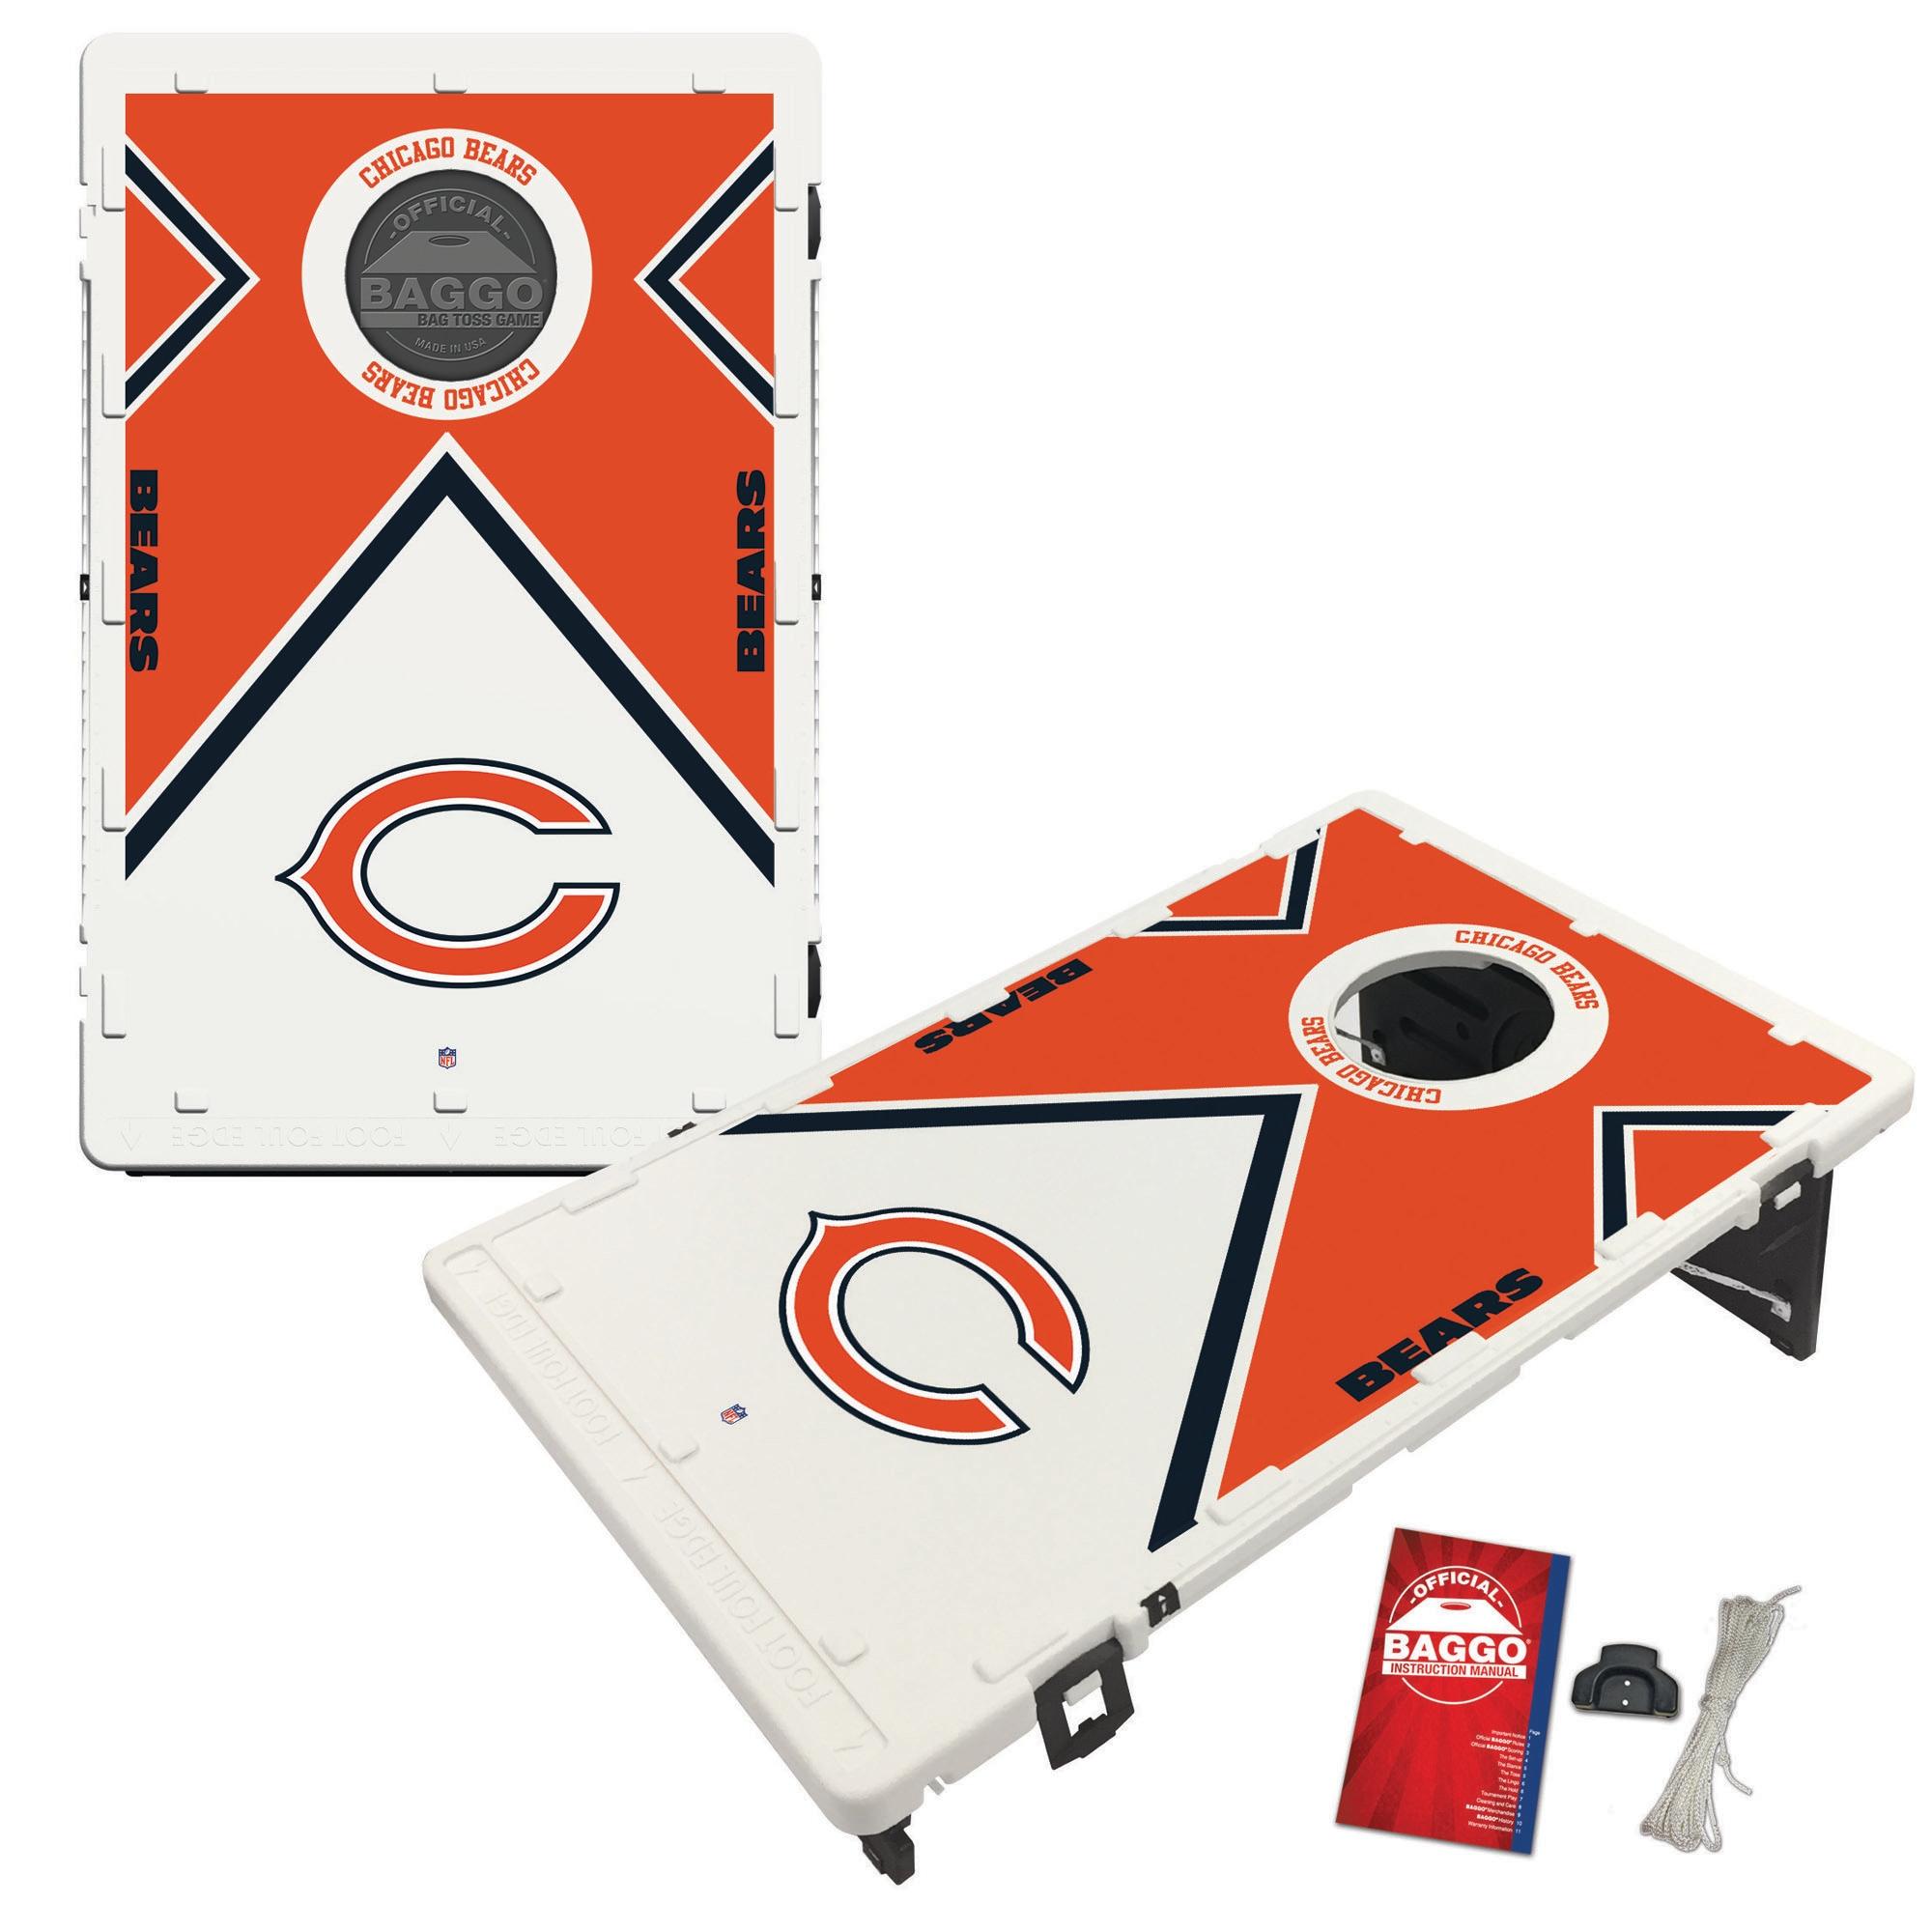 Chicago Bears 2' x 3' BAGGO Vintage Cornhole Board Tailgate Toss Set